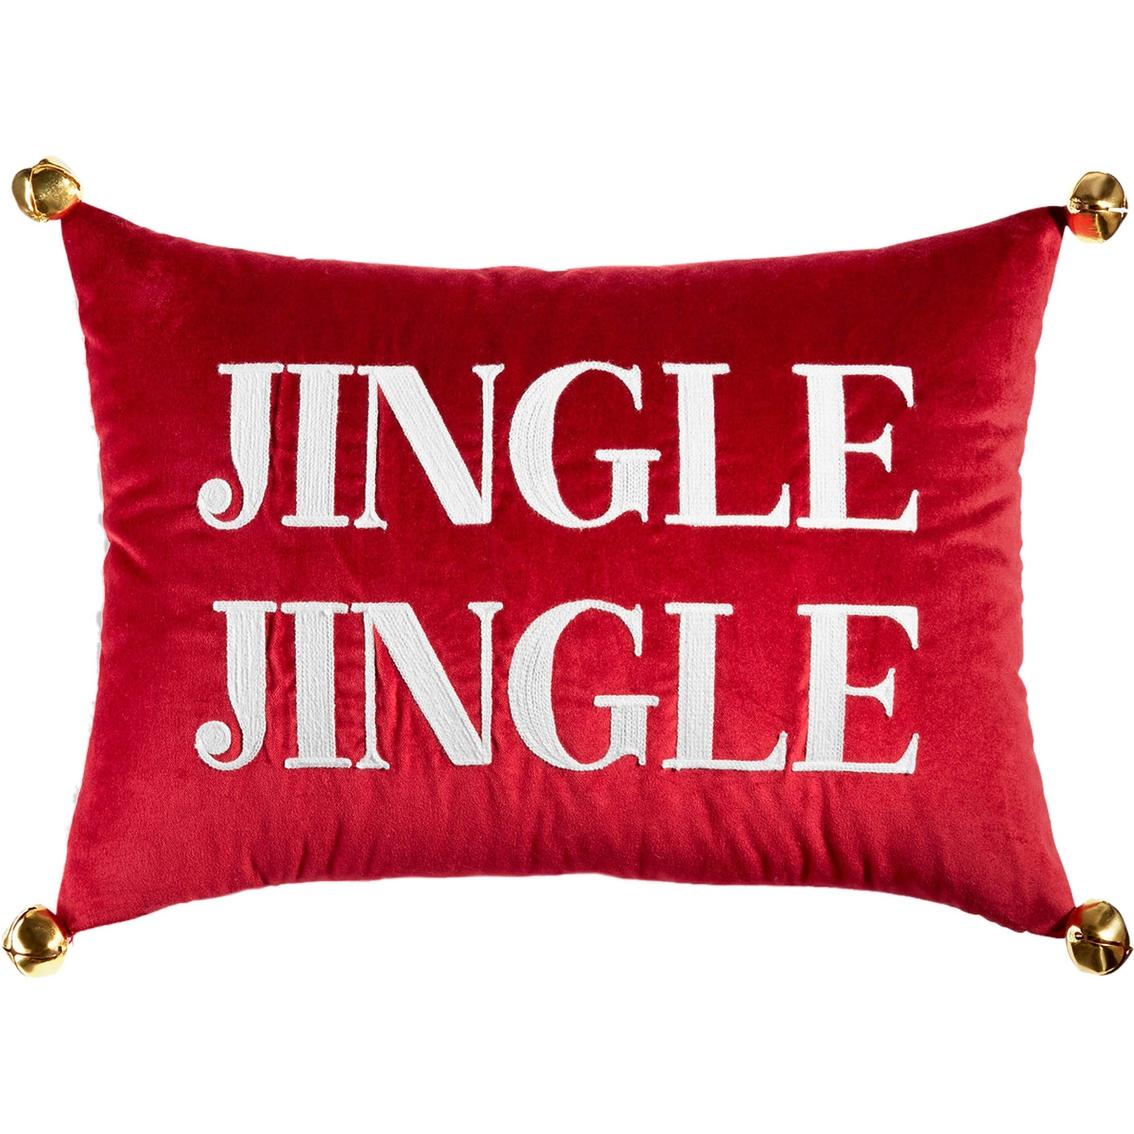 Martha Stewart Collection Jingle Velvet Decorative Pillow, 14 X 20 In. Decorative Pillows ...